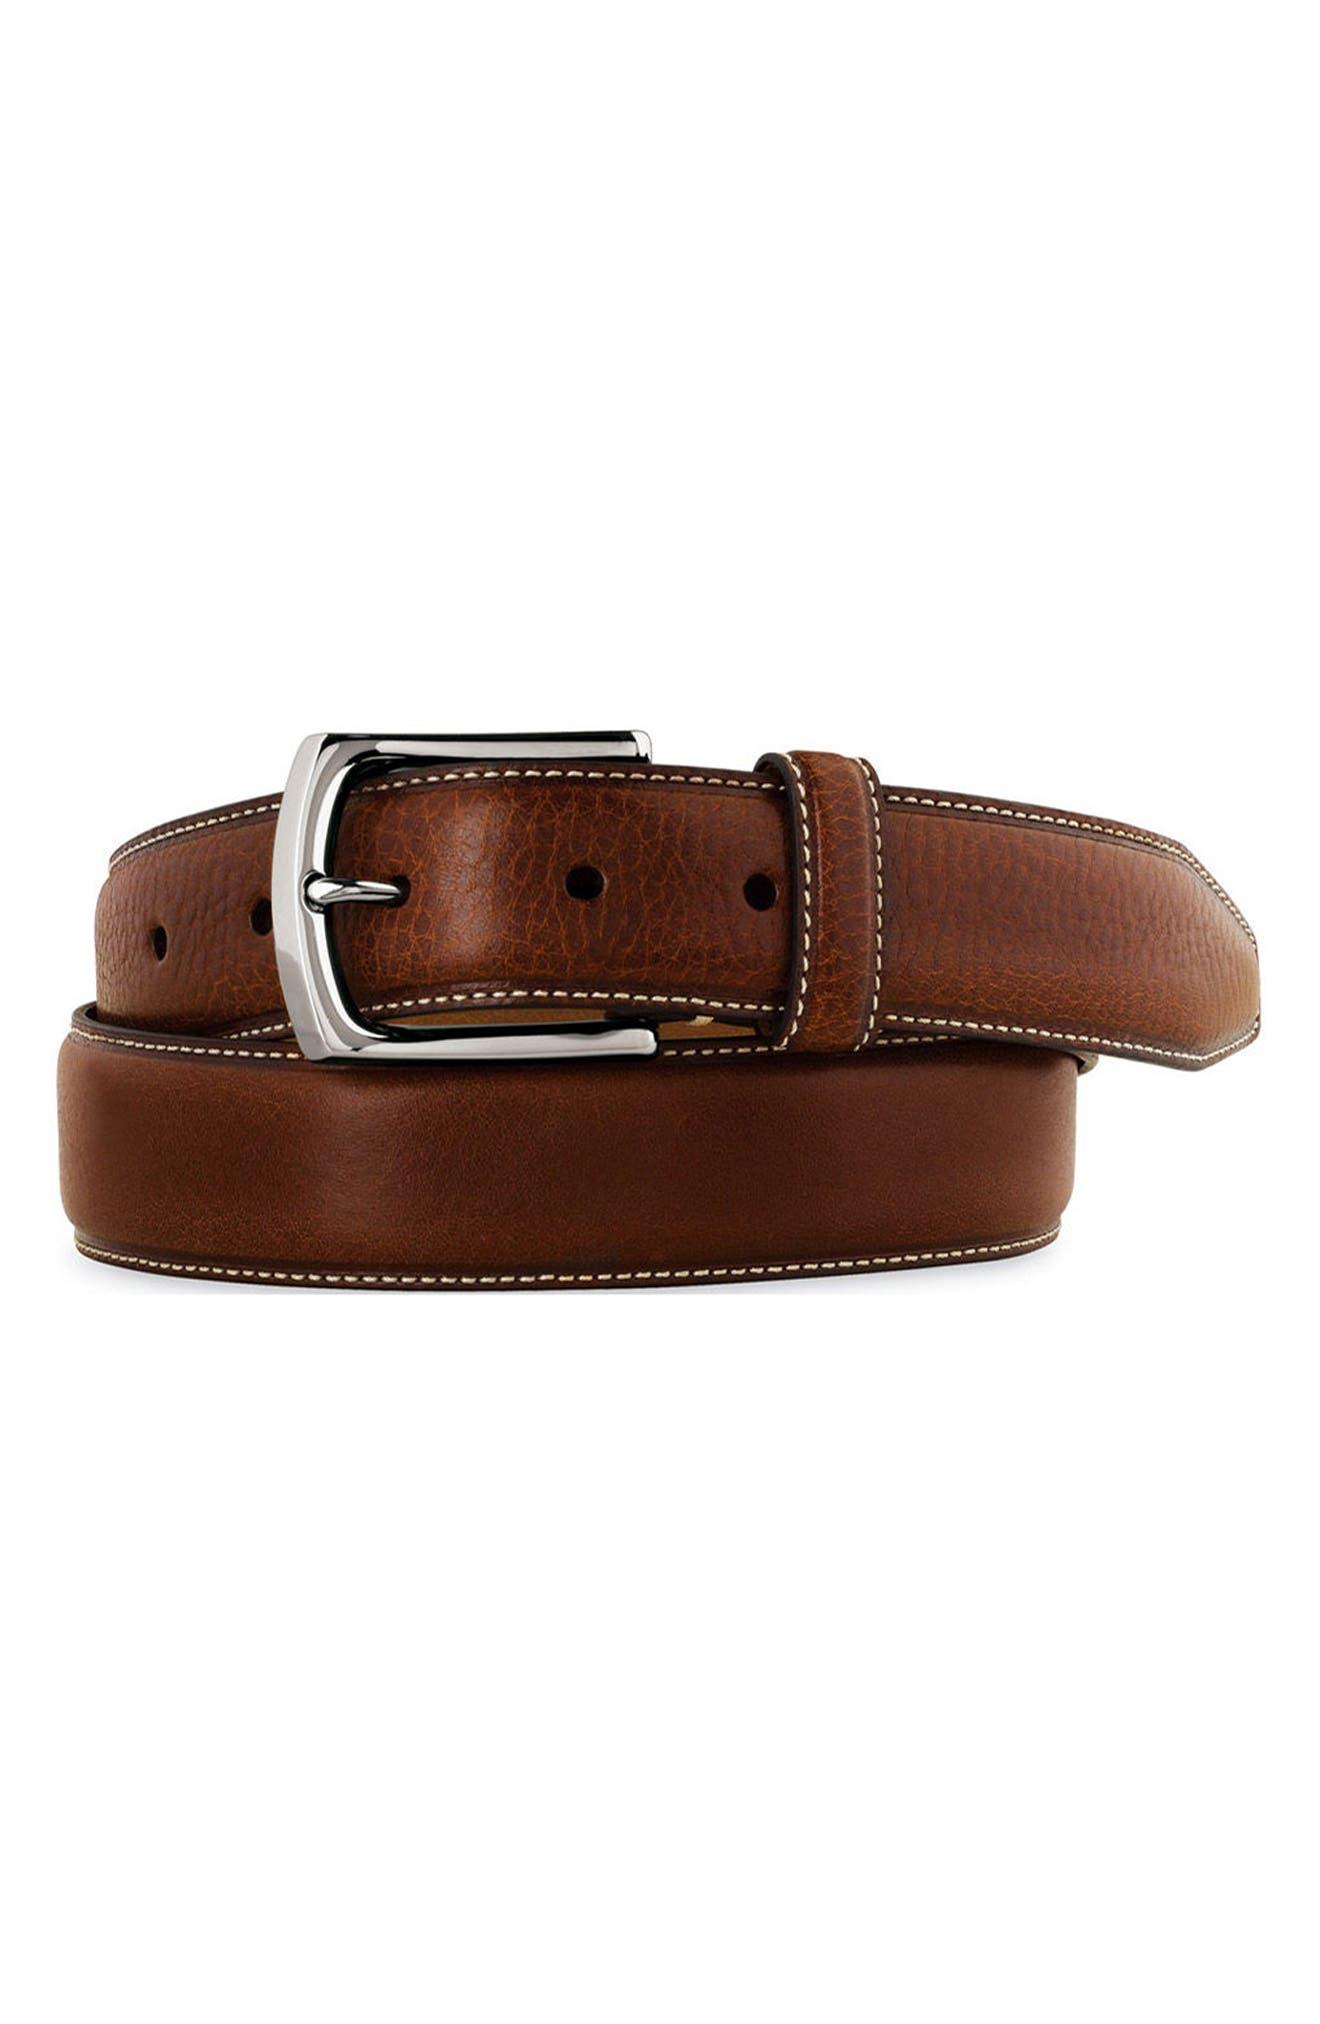 Johnston & Murphy Calfskin Leather Belt, Dark Brown